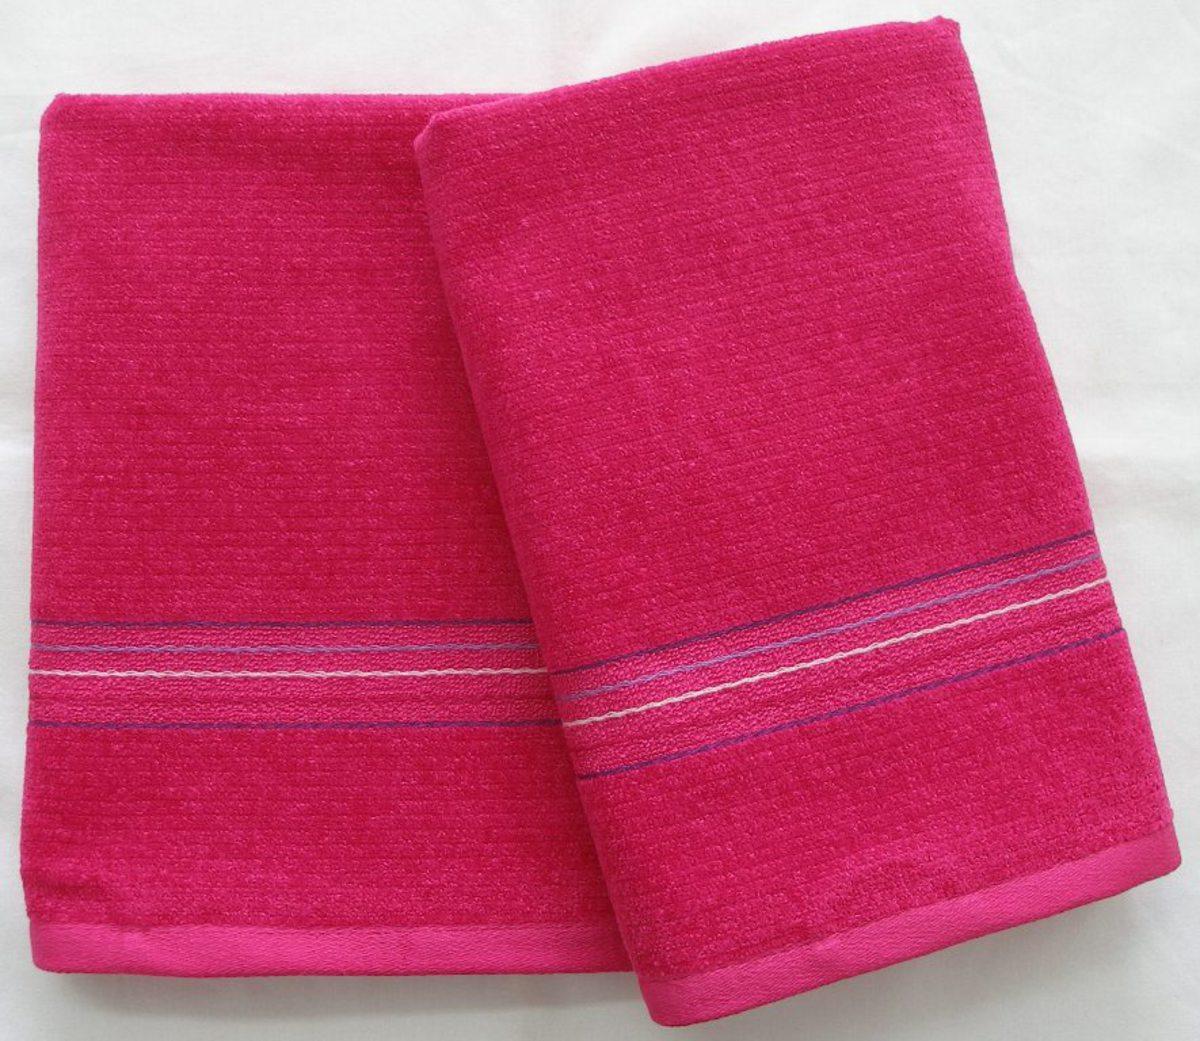 FORBYT, Ručník nebo osuška, EVA, růžovo-fialová 70 x 140 cm